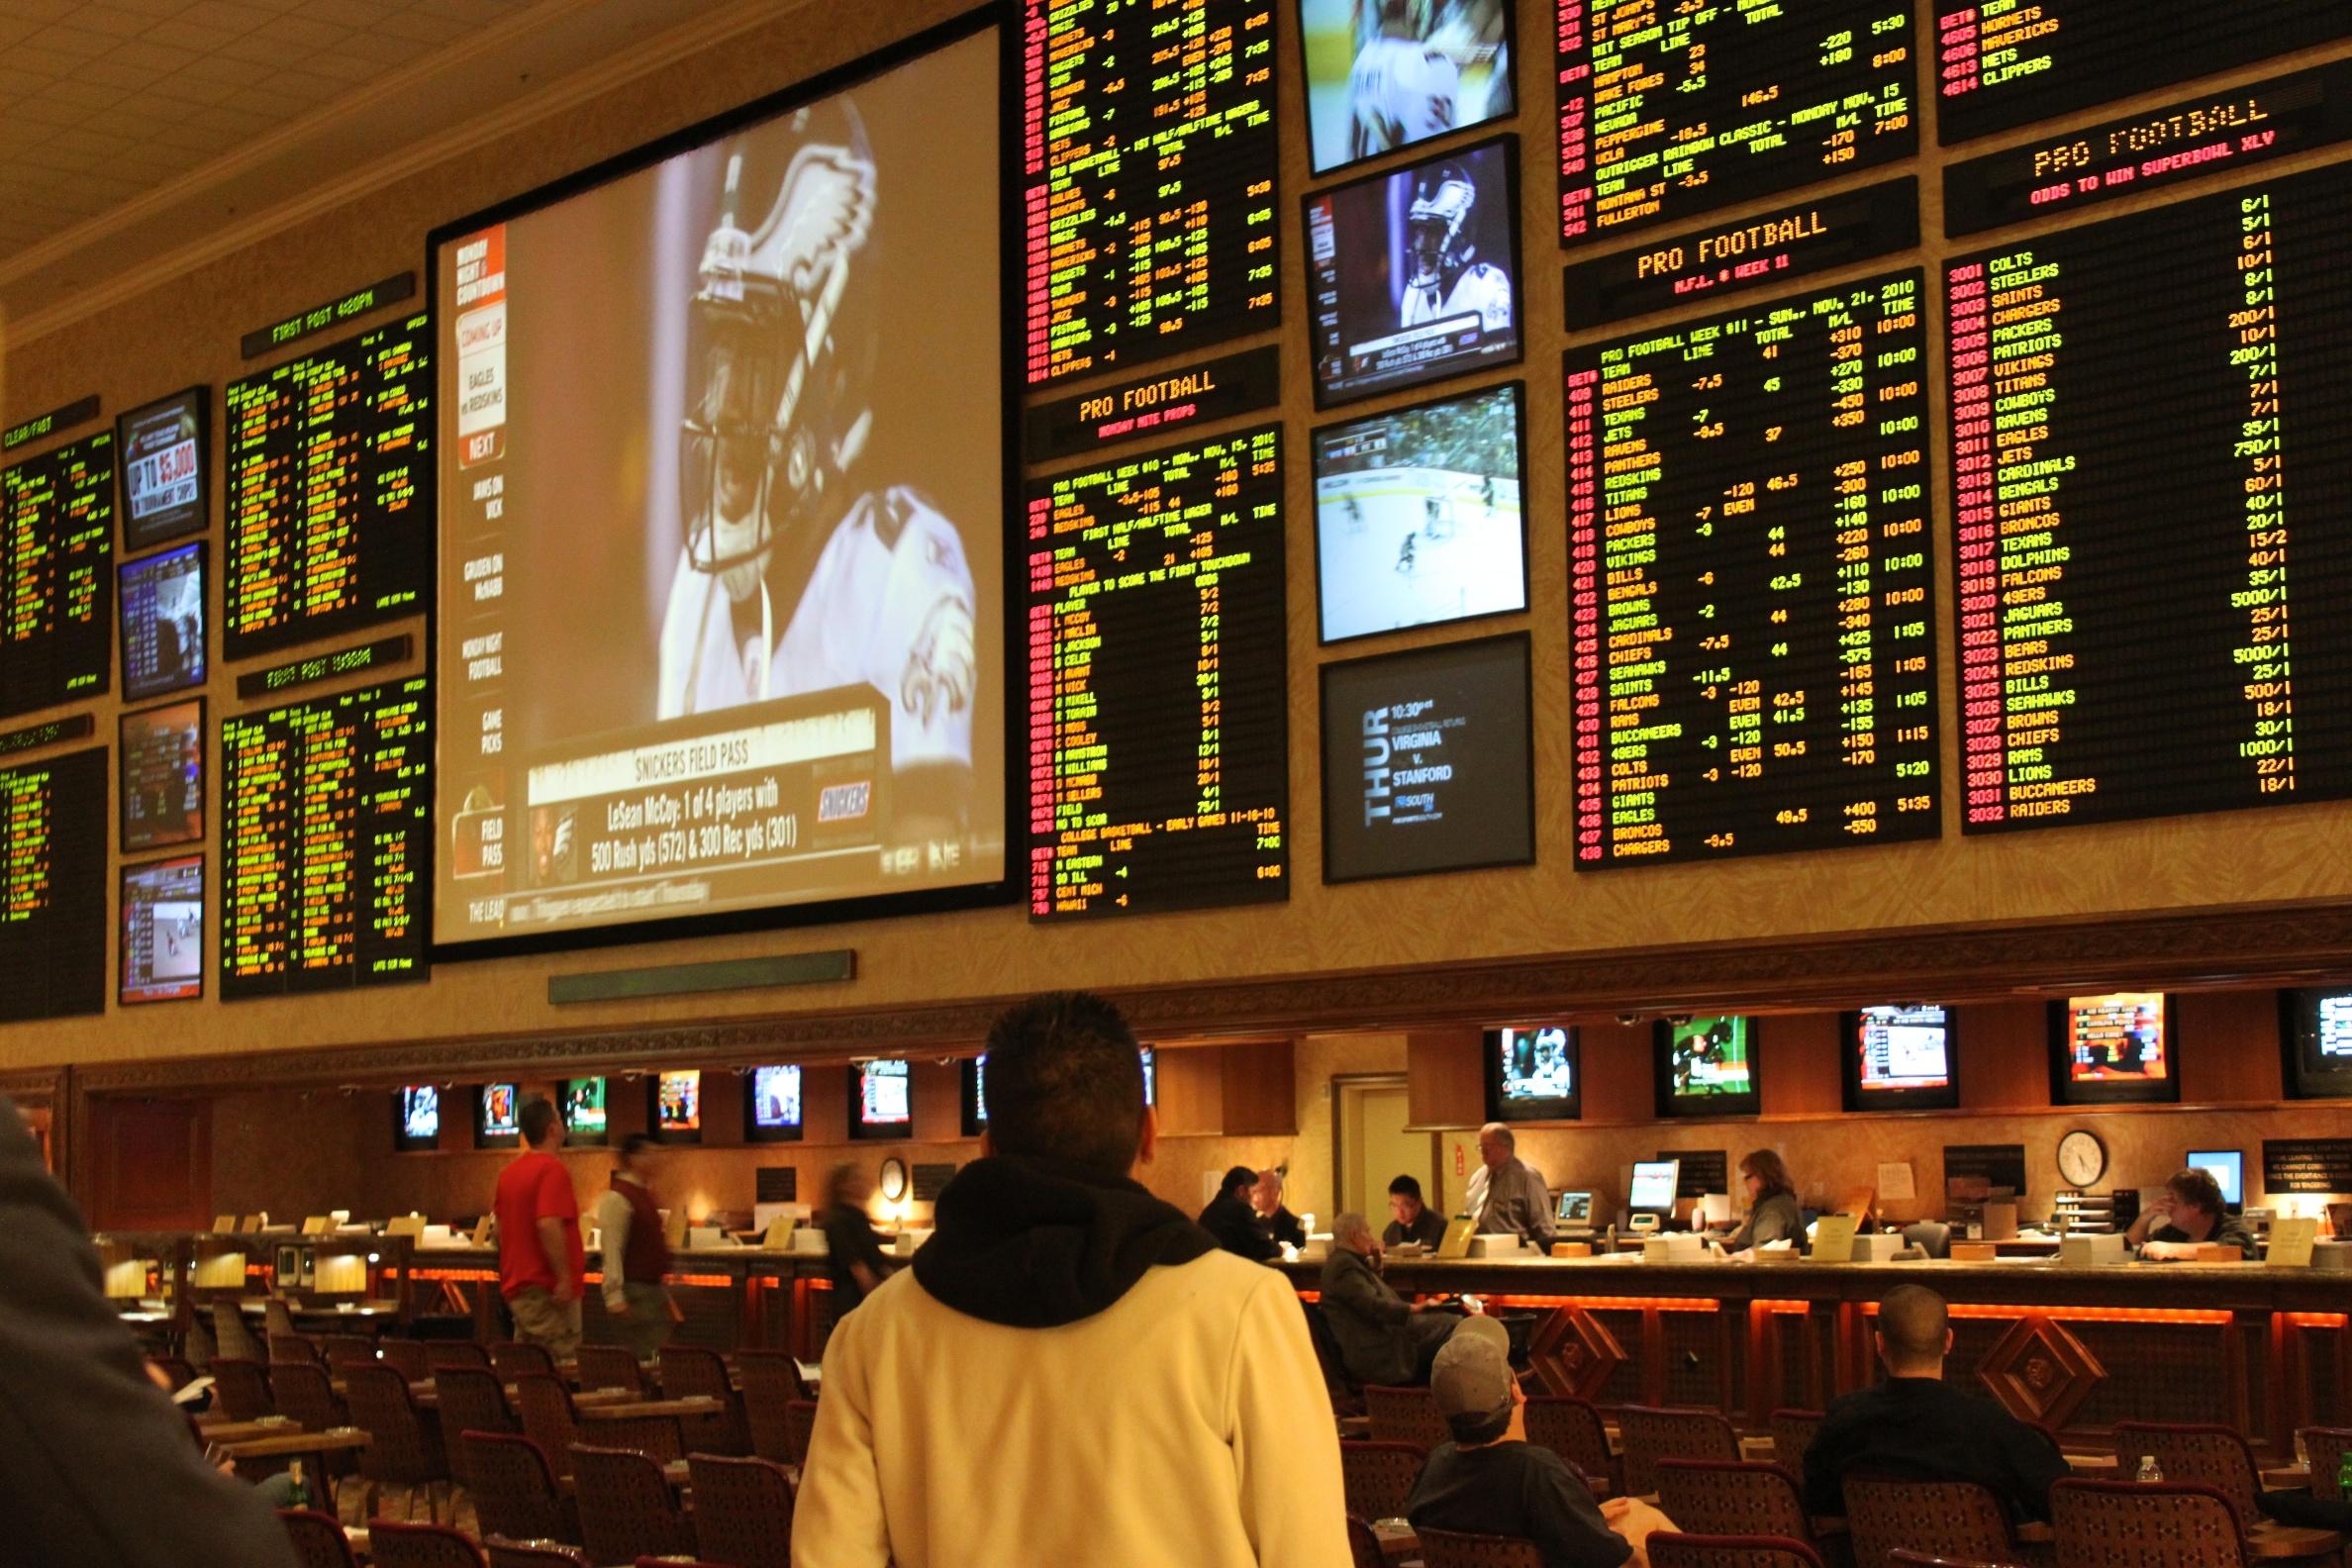 las vegas sportsbook online betting